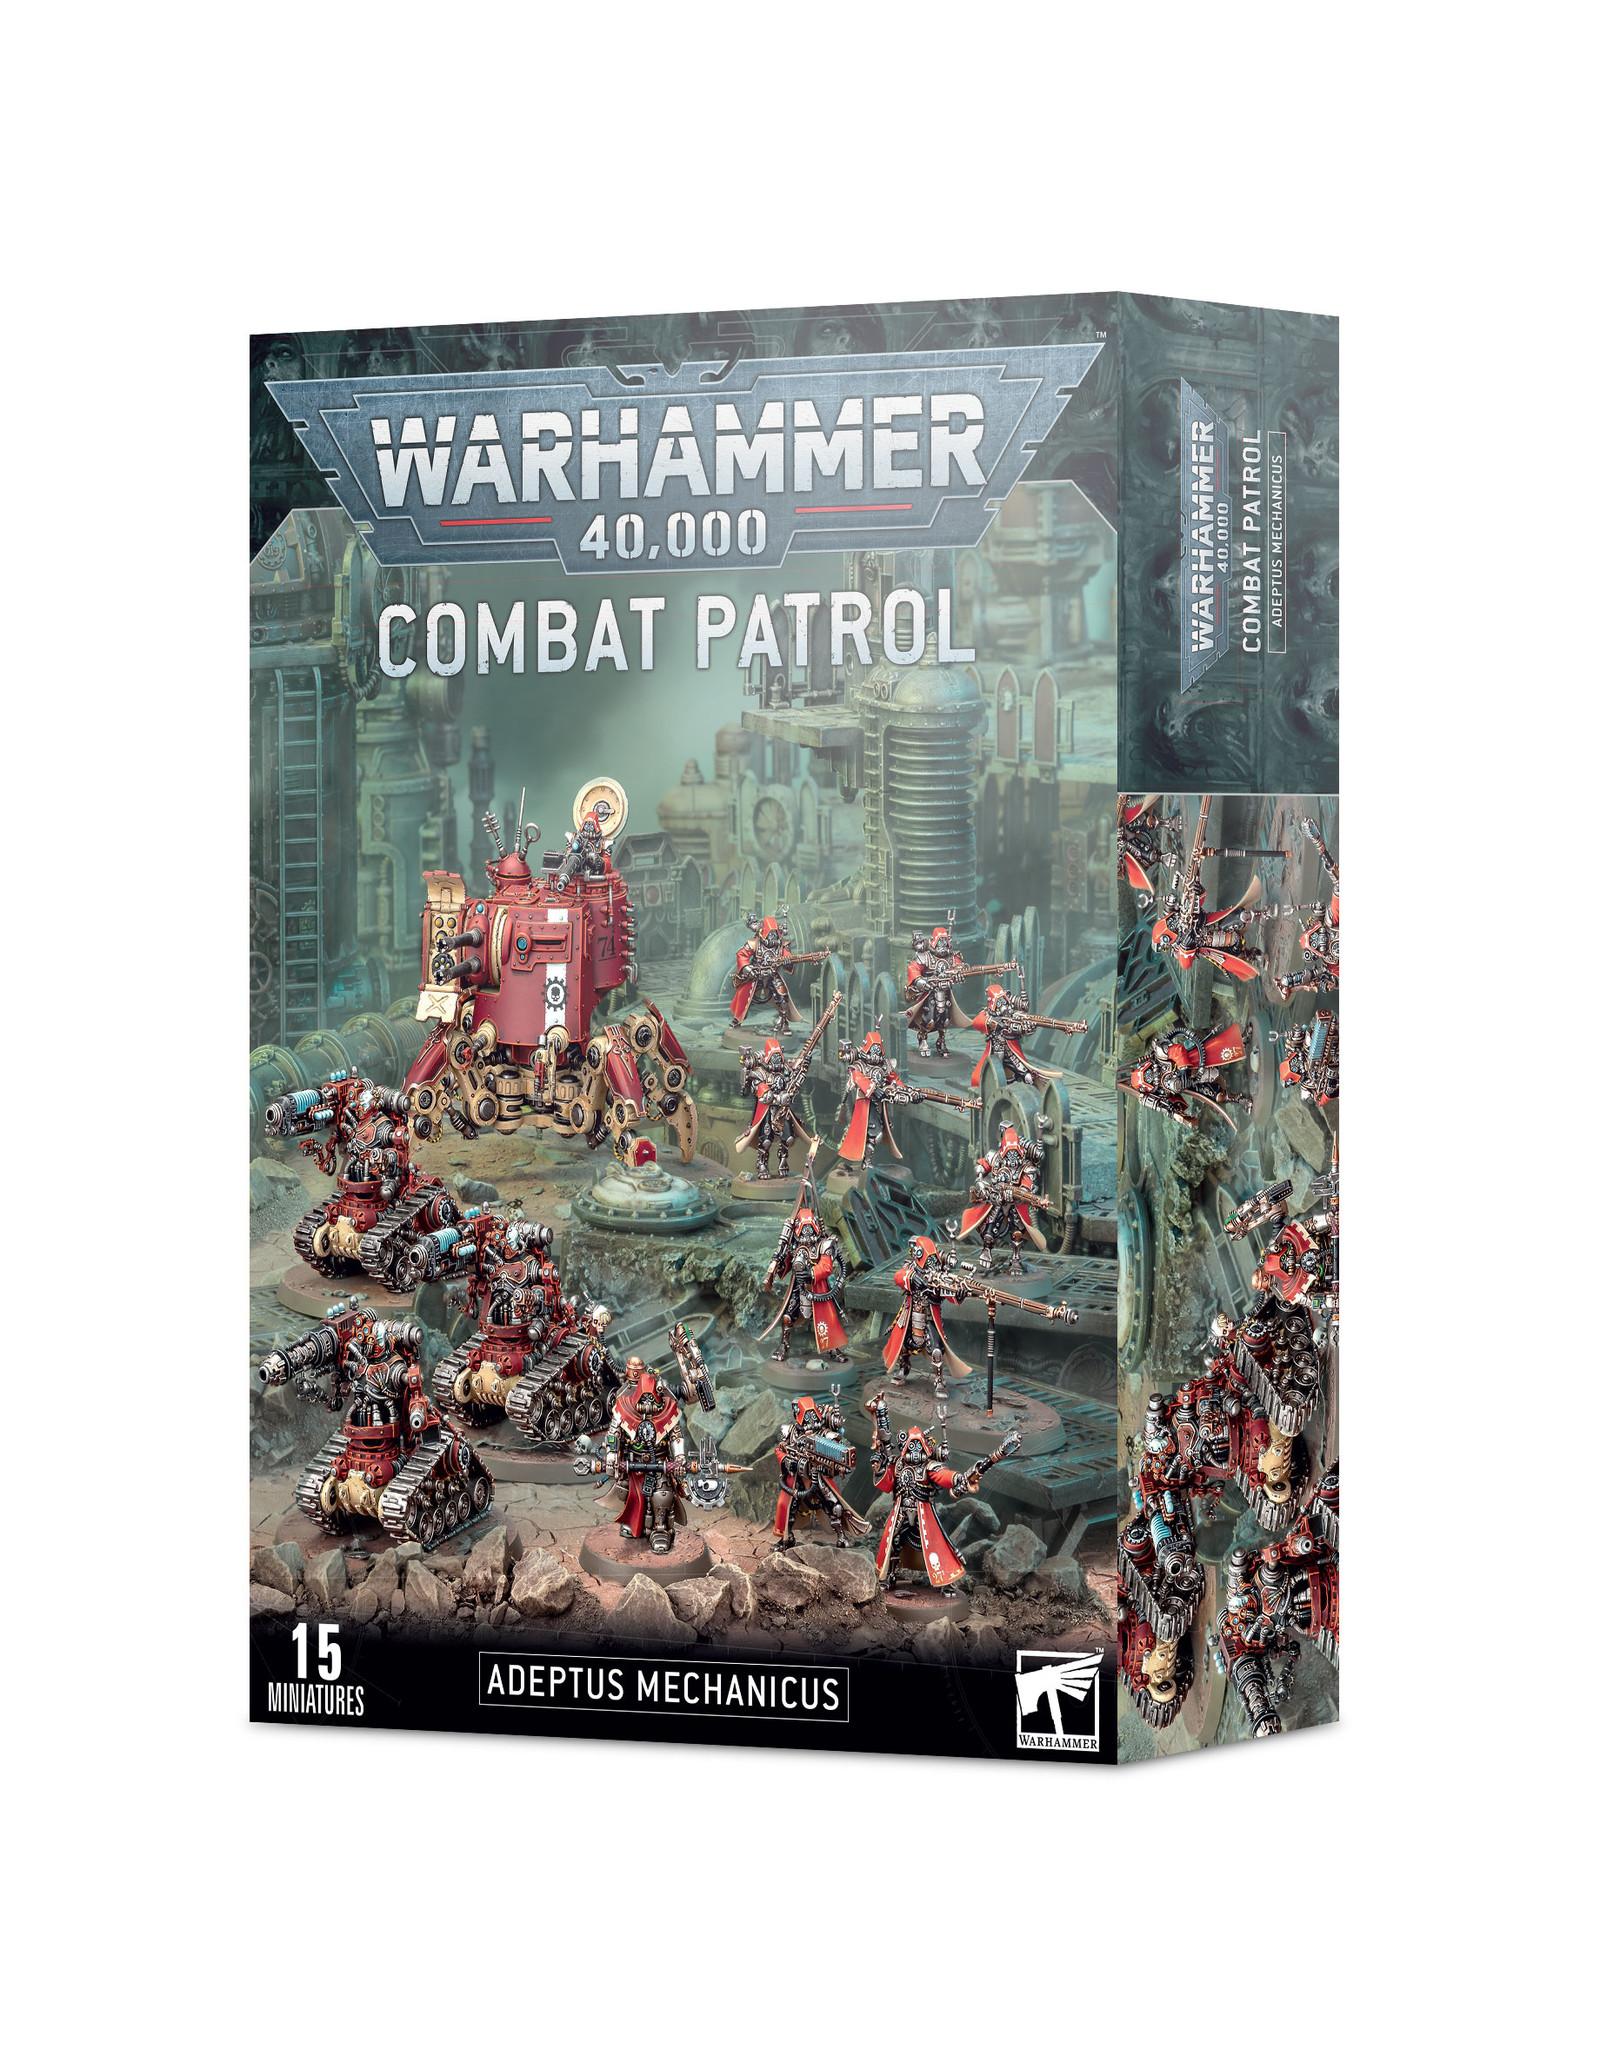 Warhammer 40K Combat Patrol: Adeptus Mechanicus